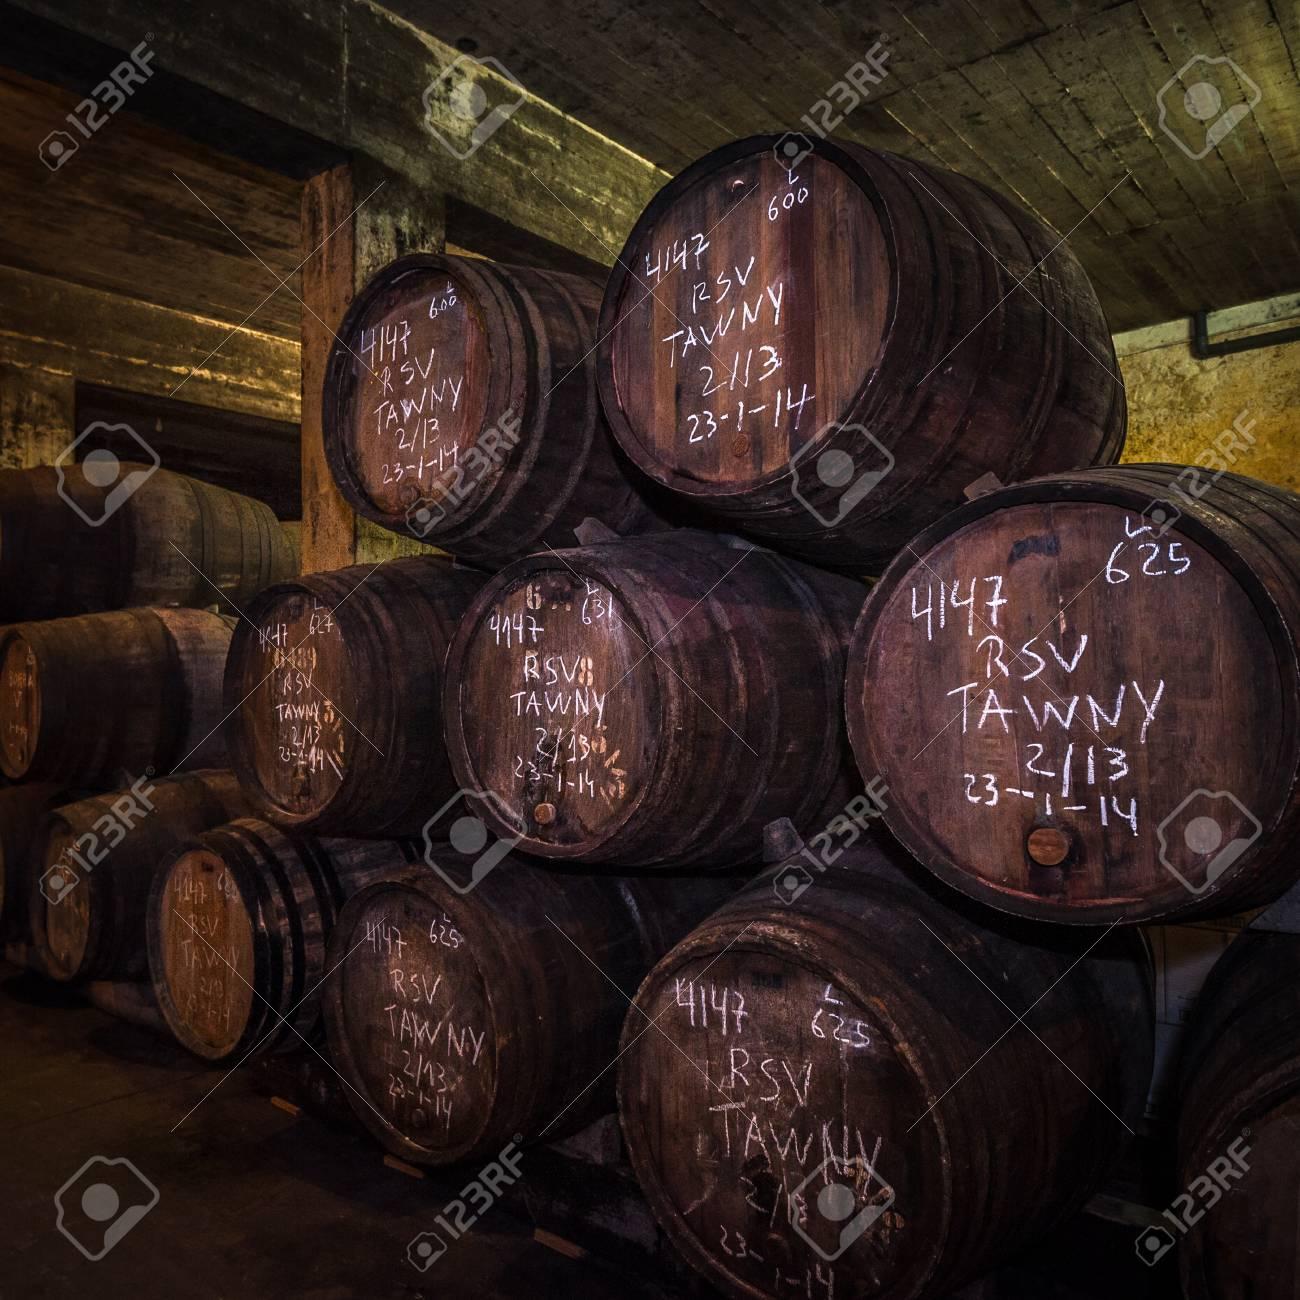 Port wine barrels in cellar, Vila Nova de Gaia, Porto, Portugal - 96074334